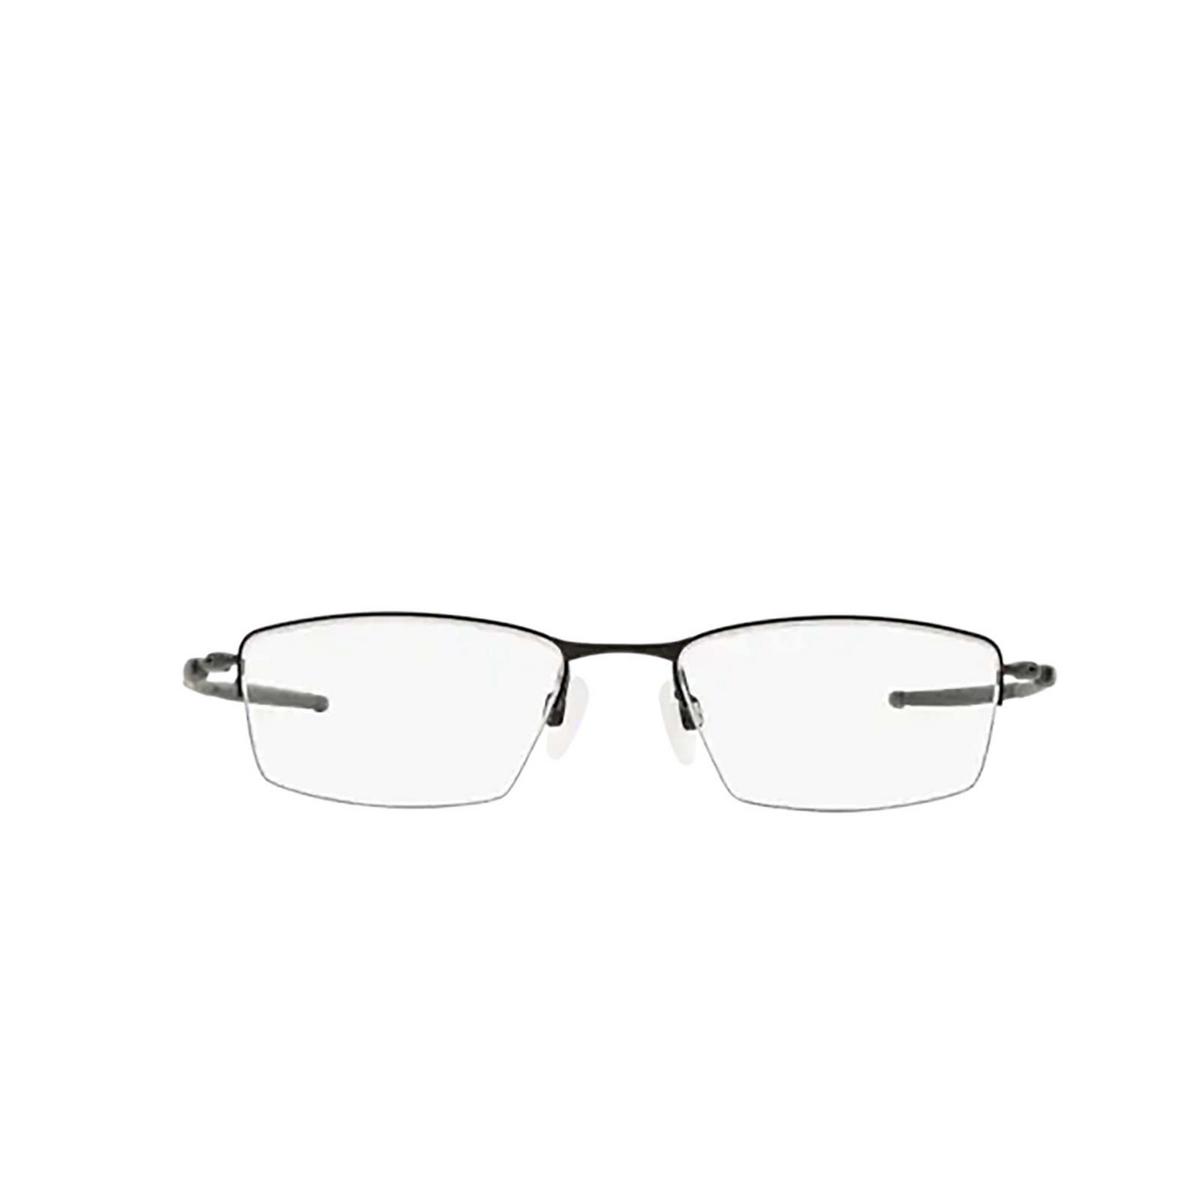 Oakley® Rectangle Eyeglasses: Lizard OX5113 color Satin Black 511301 - front view.